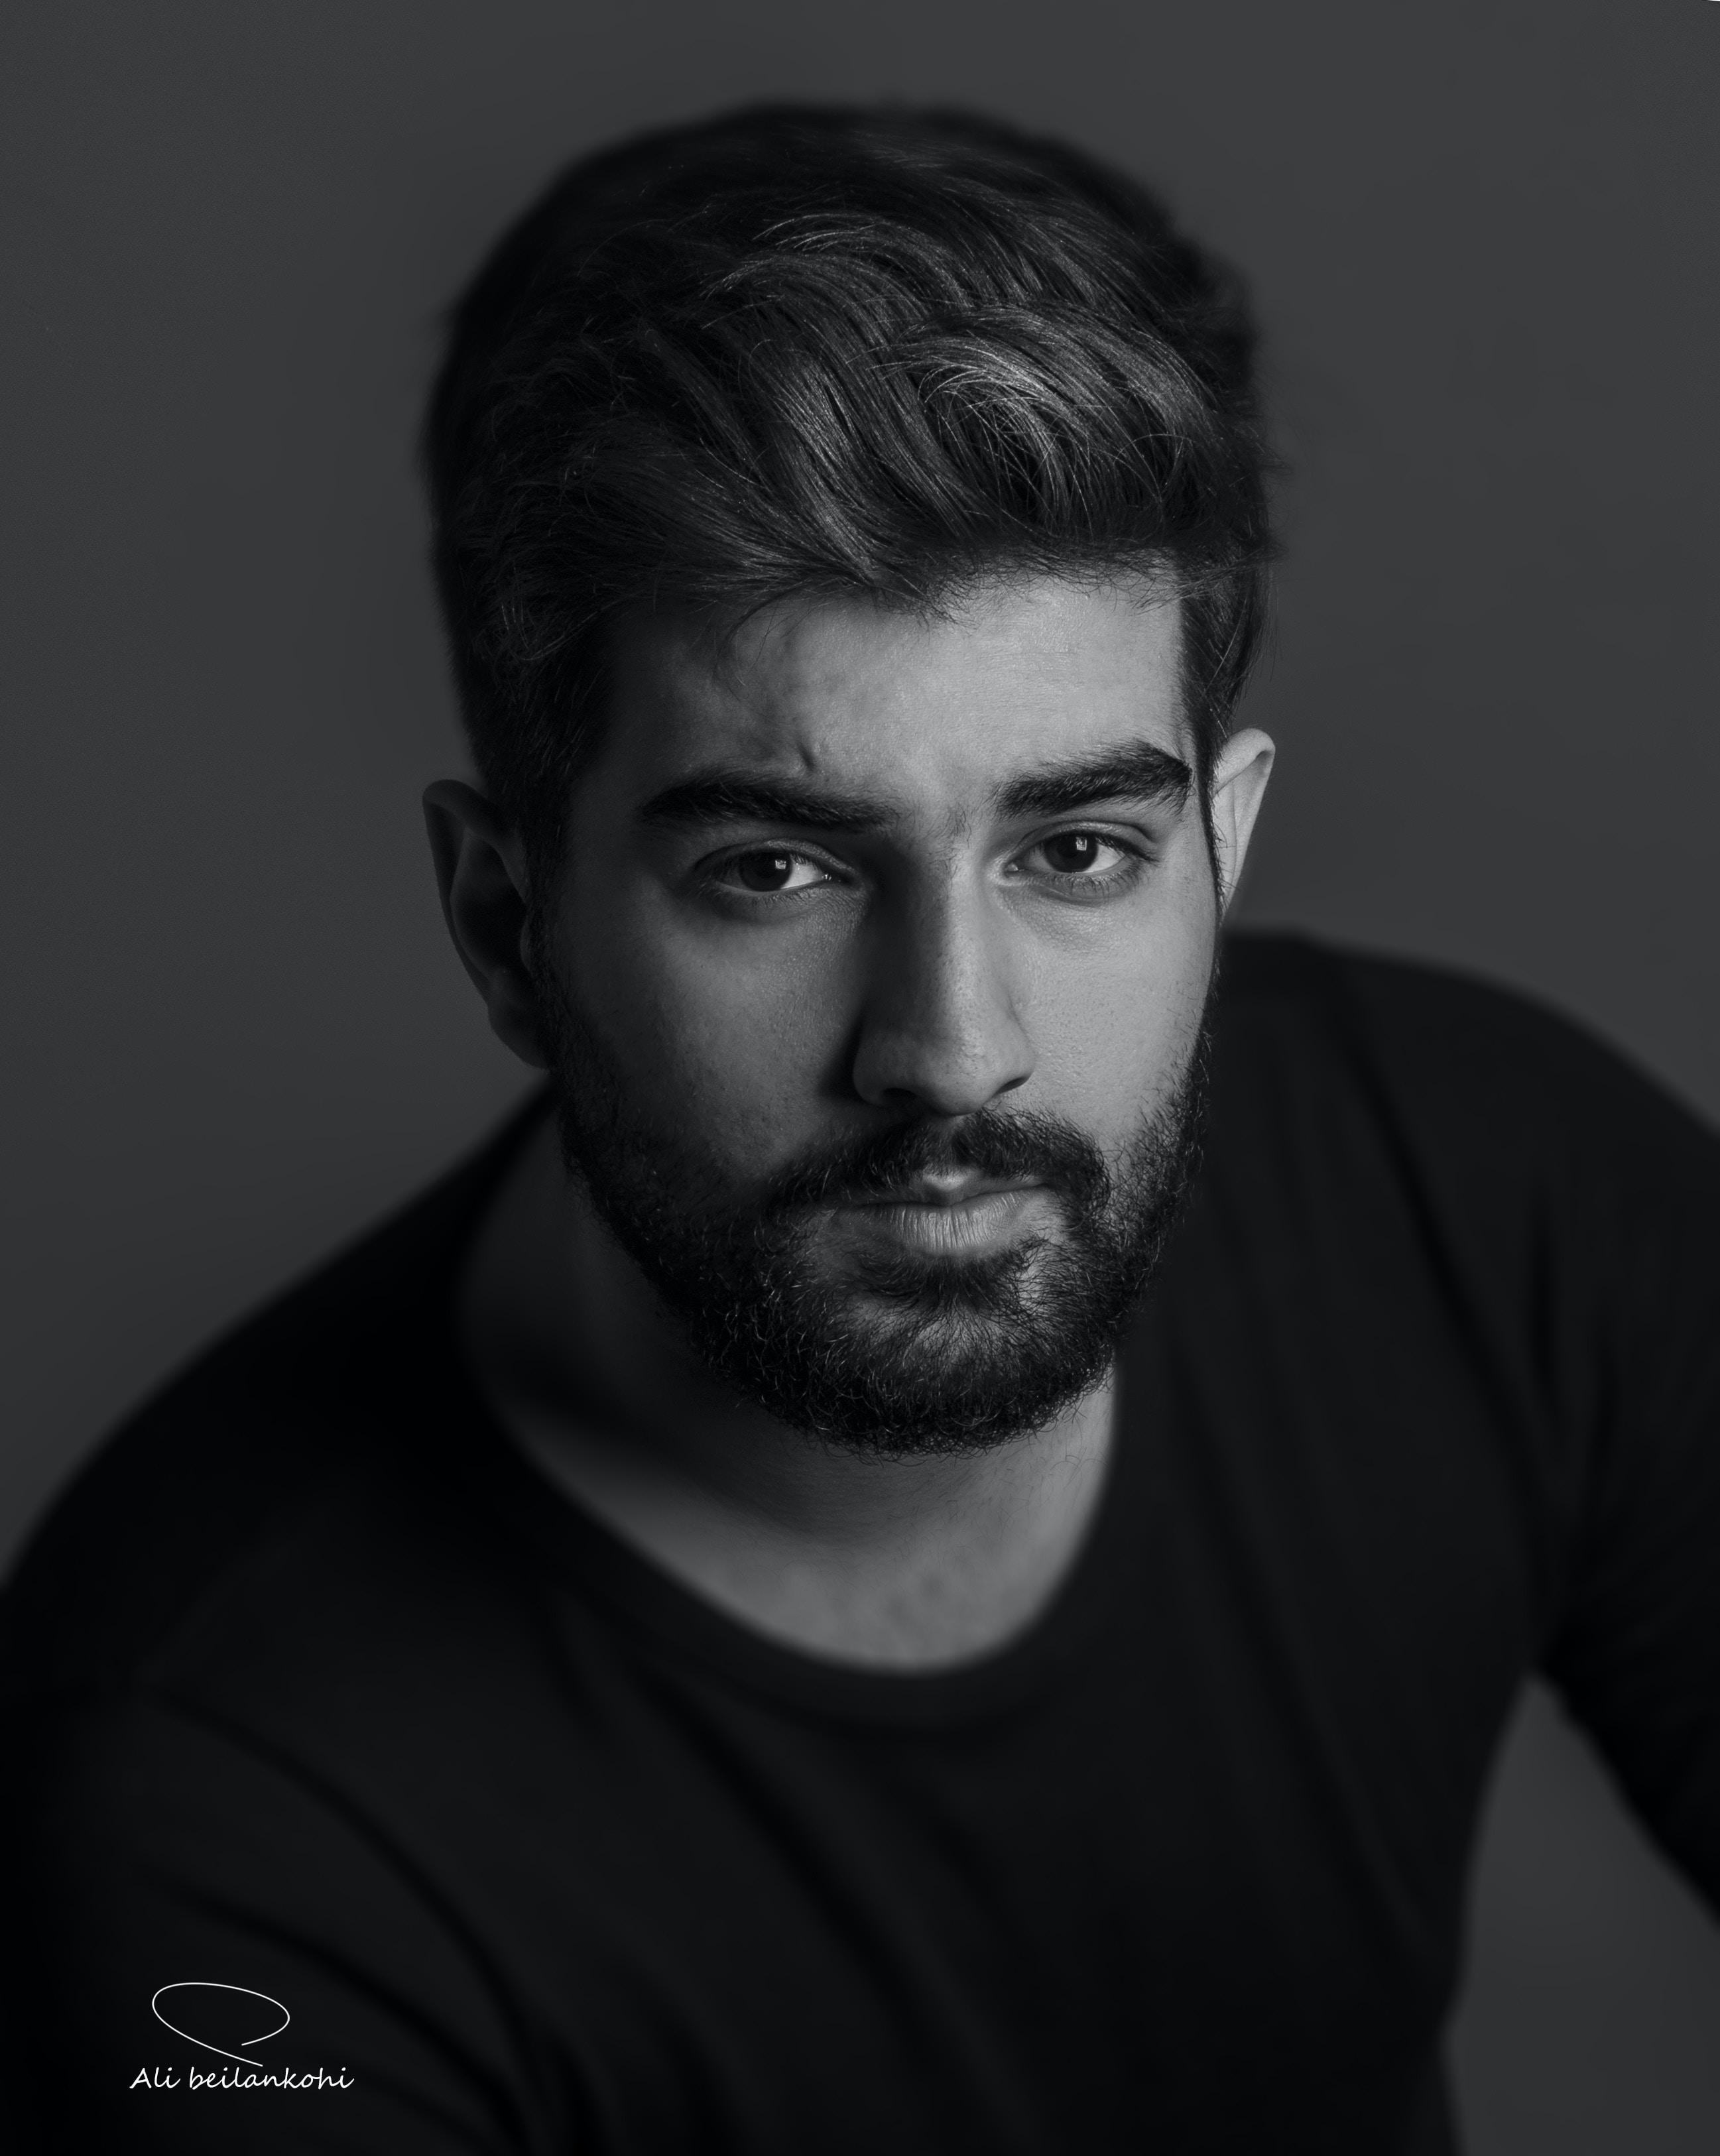 Go to Ali Beilankouhi's profile